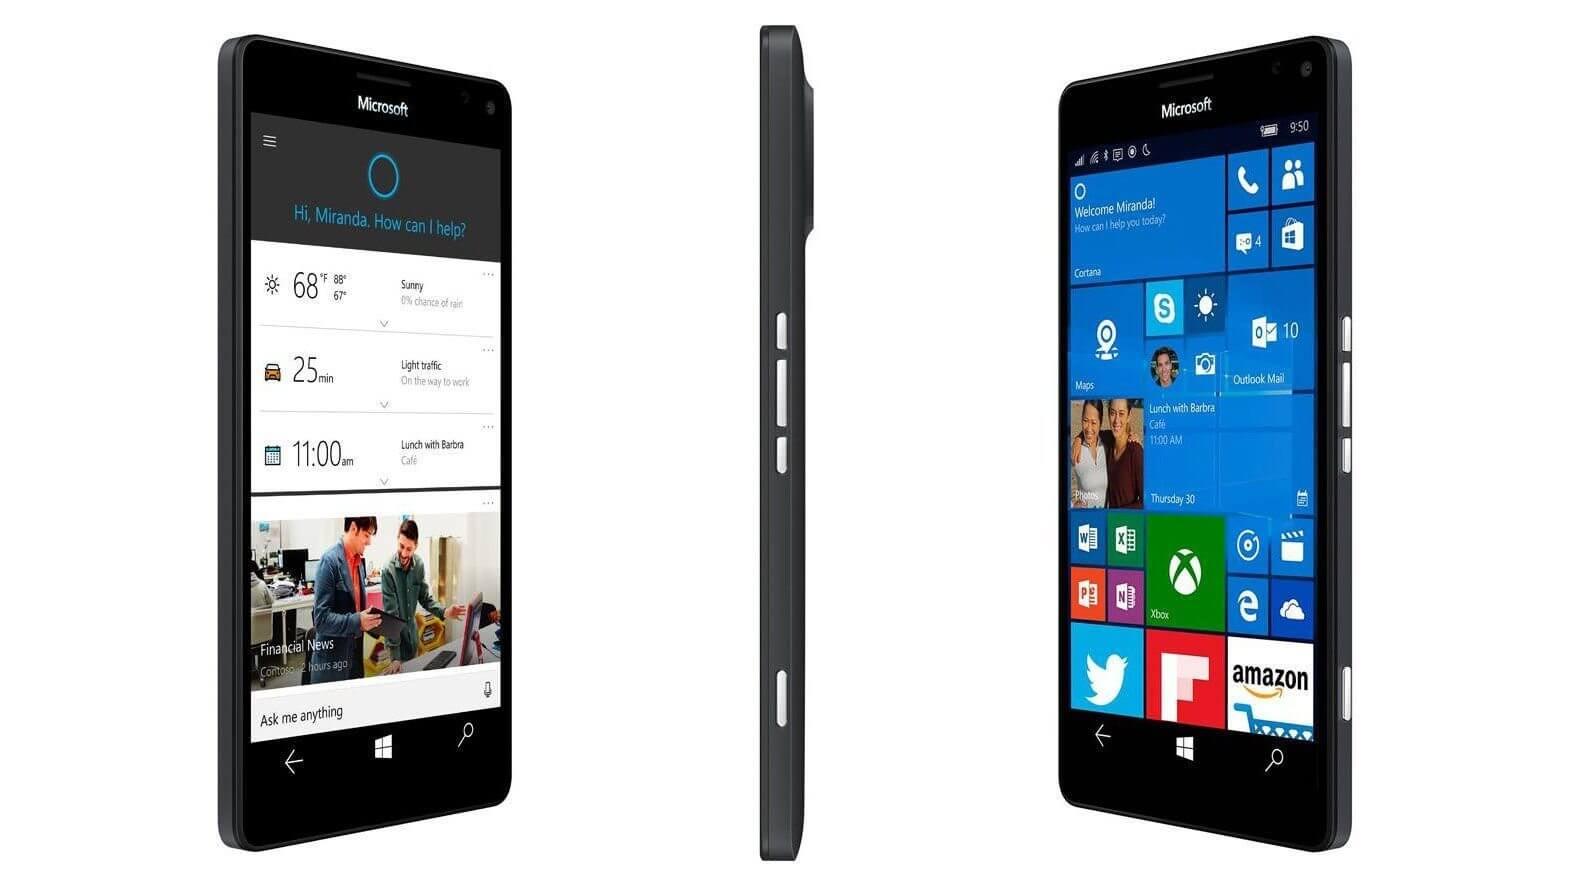 microsoft lumia 950 950 xl price release date specs uk features - Lumia 950 era mais interessante no plano original da Microsoft